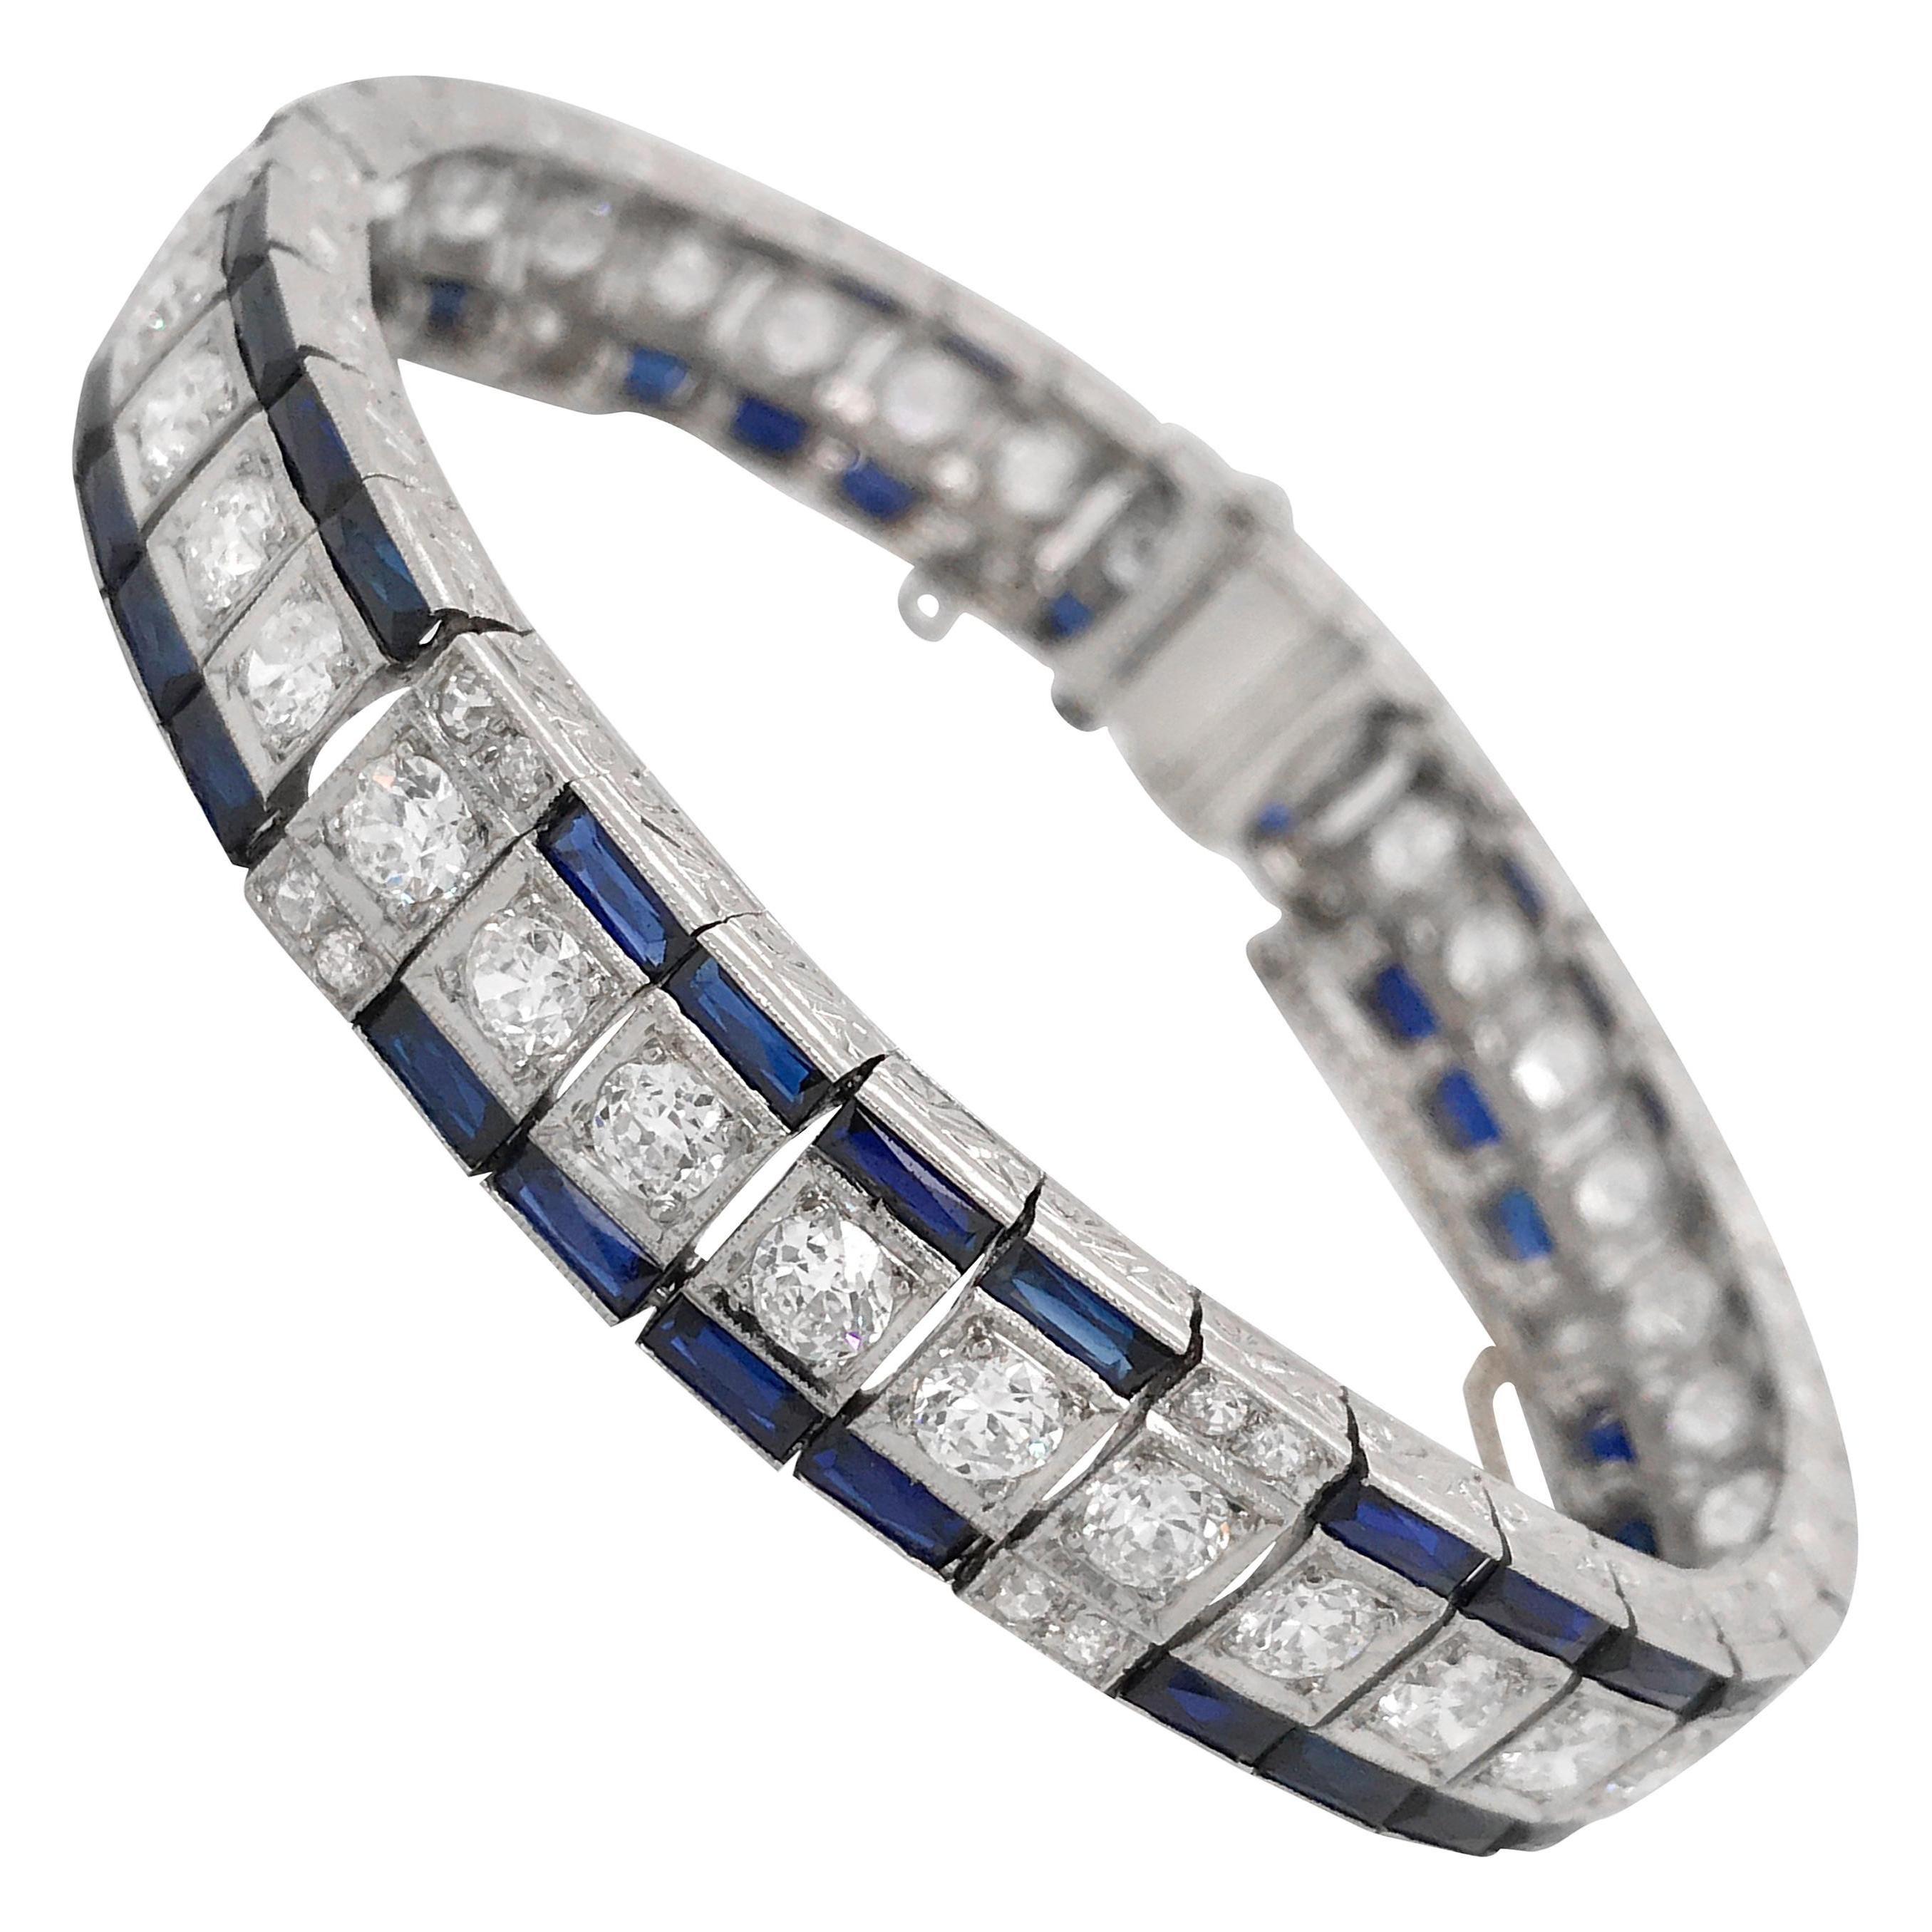 Diamond Bracelet with Sapphire, Tiffany & Co.